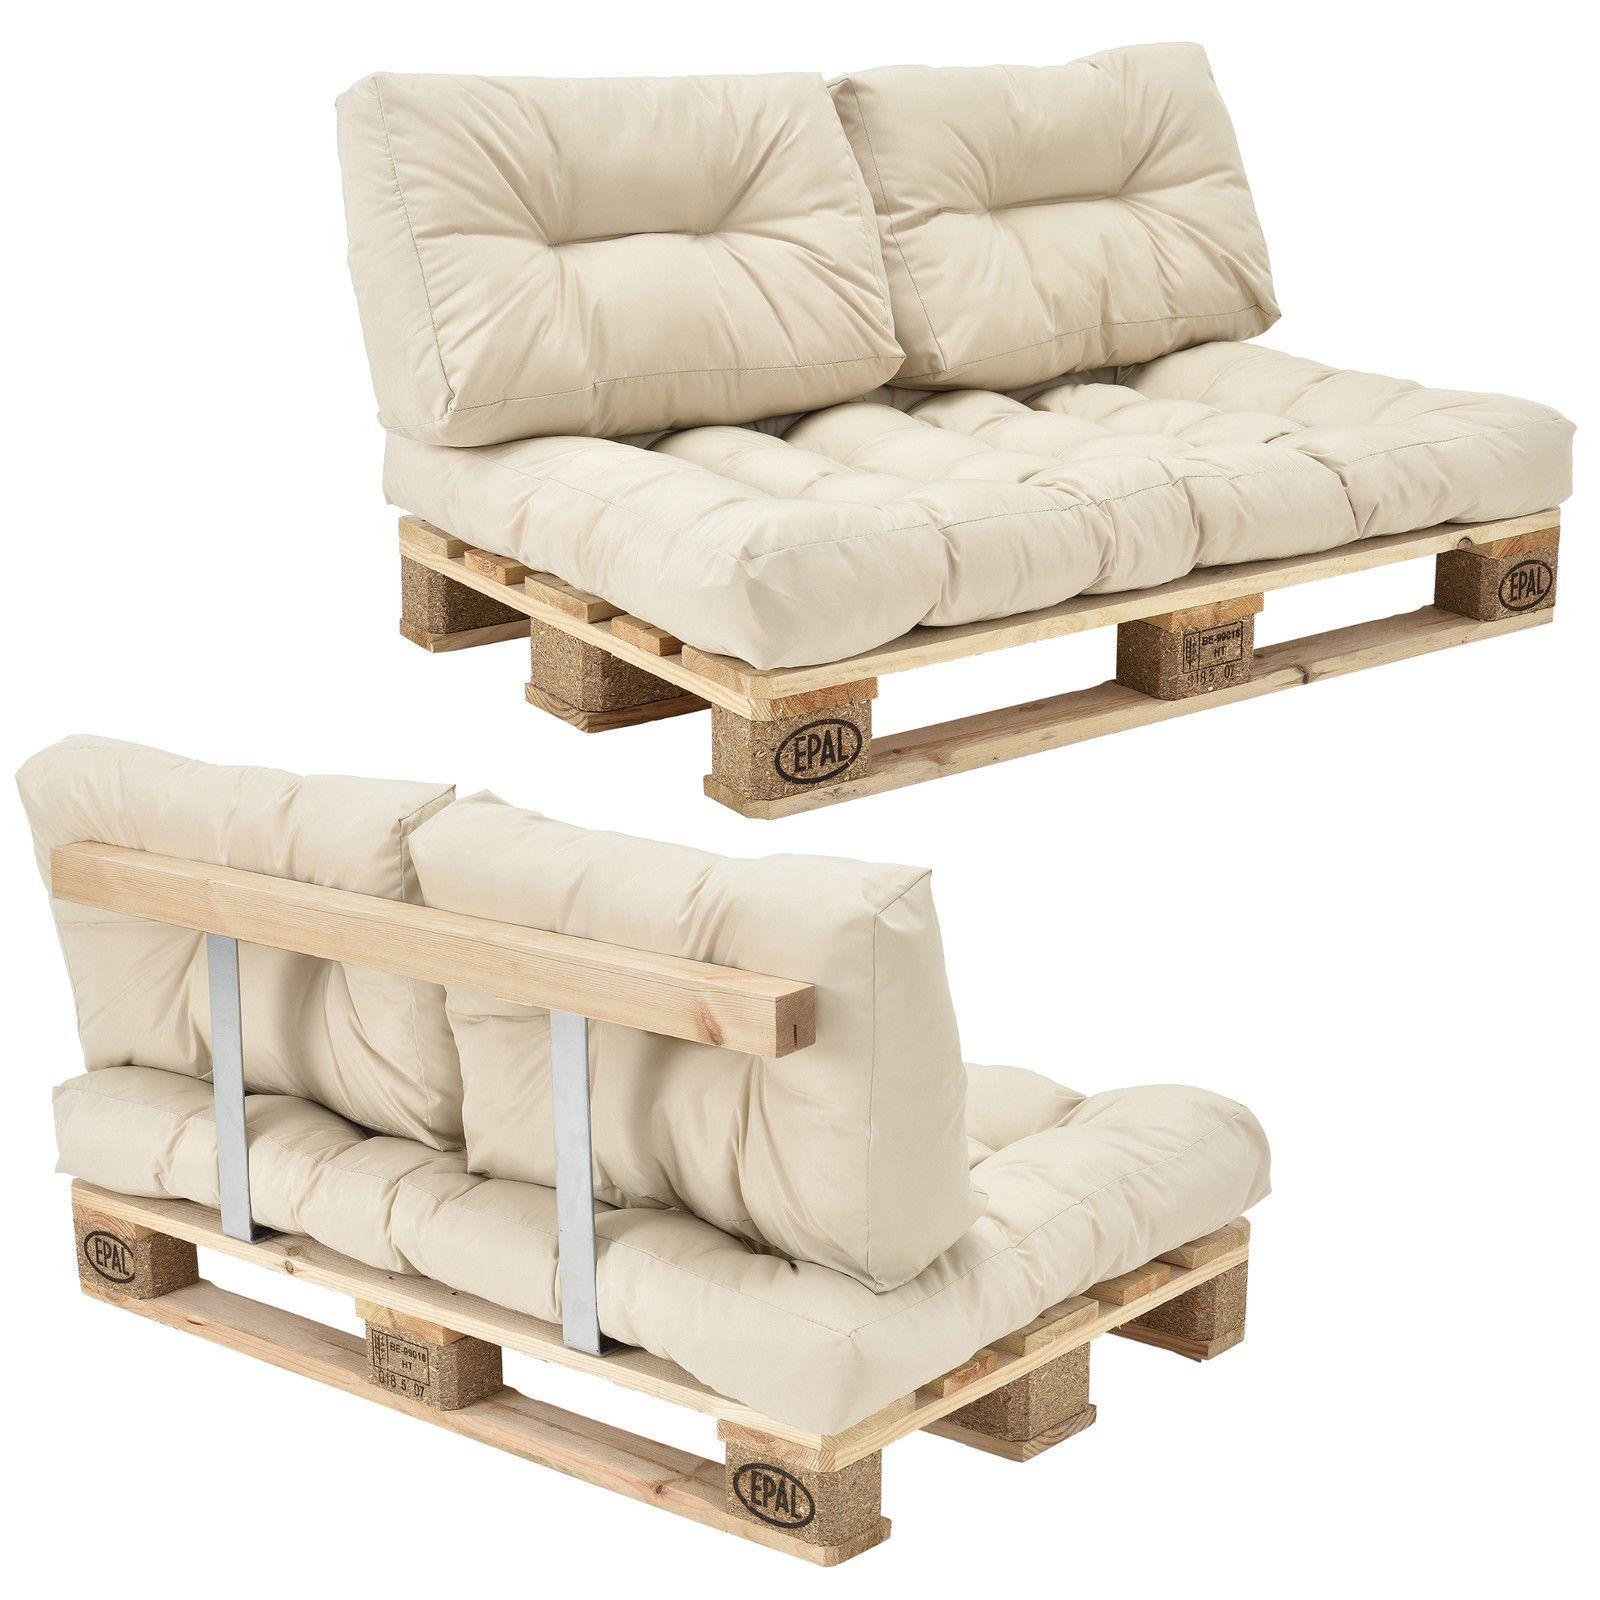 S Cale El M Ximo Partido A Tu Terraza Con Esta Genial Idea Para  ~ Sillon Relax Galeria Del Coleccionista